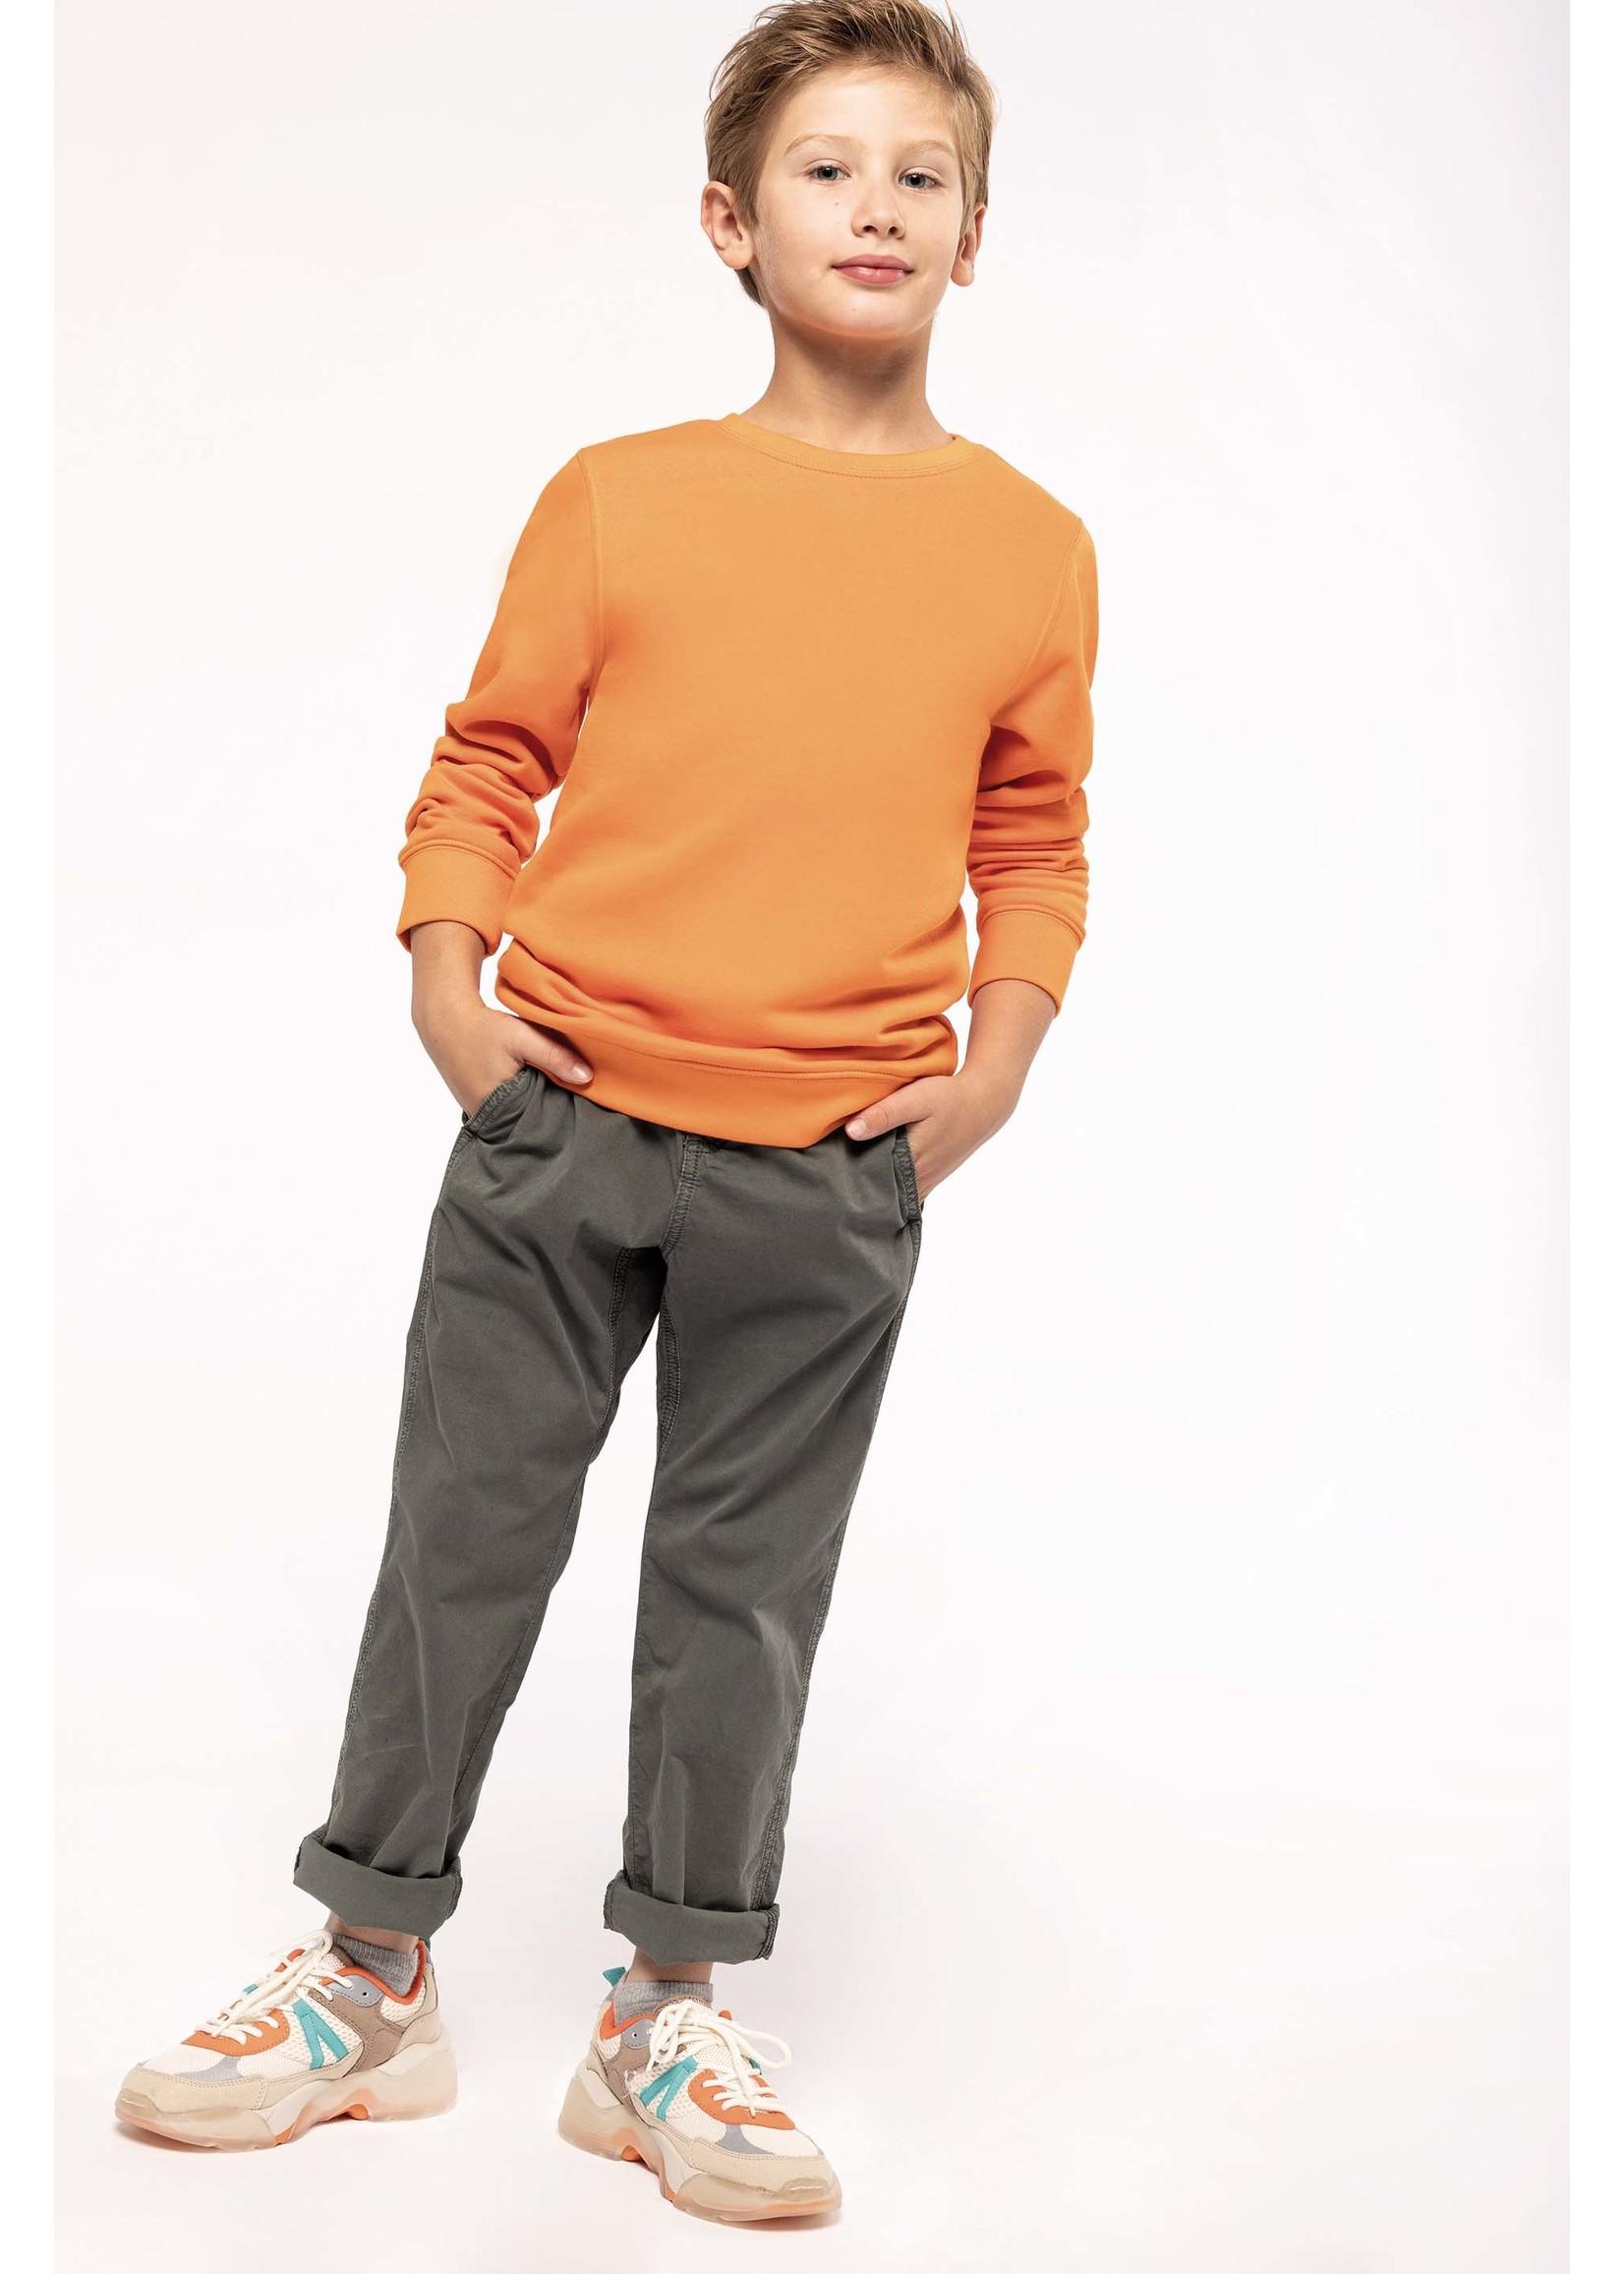 Eco-Friendly Crew Neck Sweater Kids-Sage